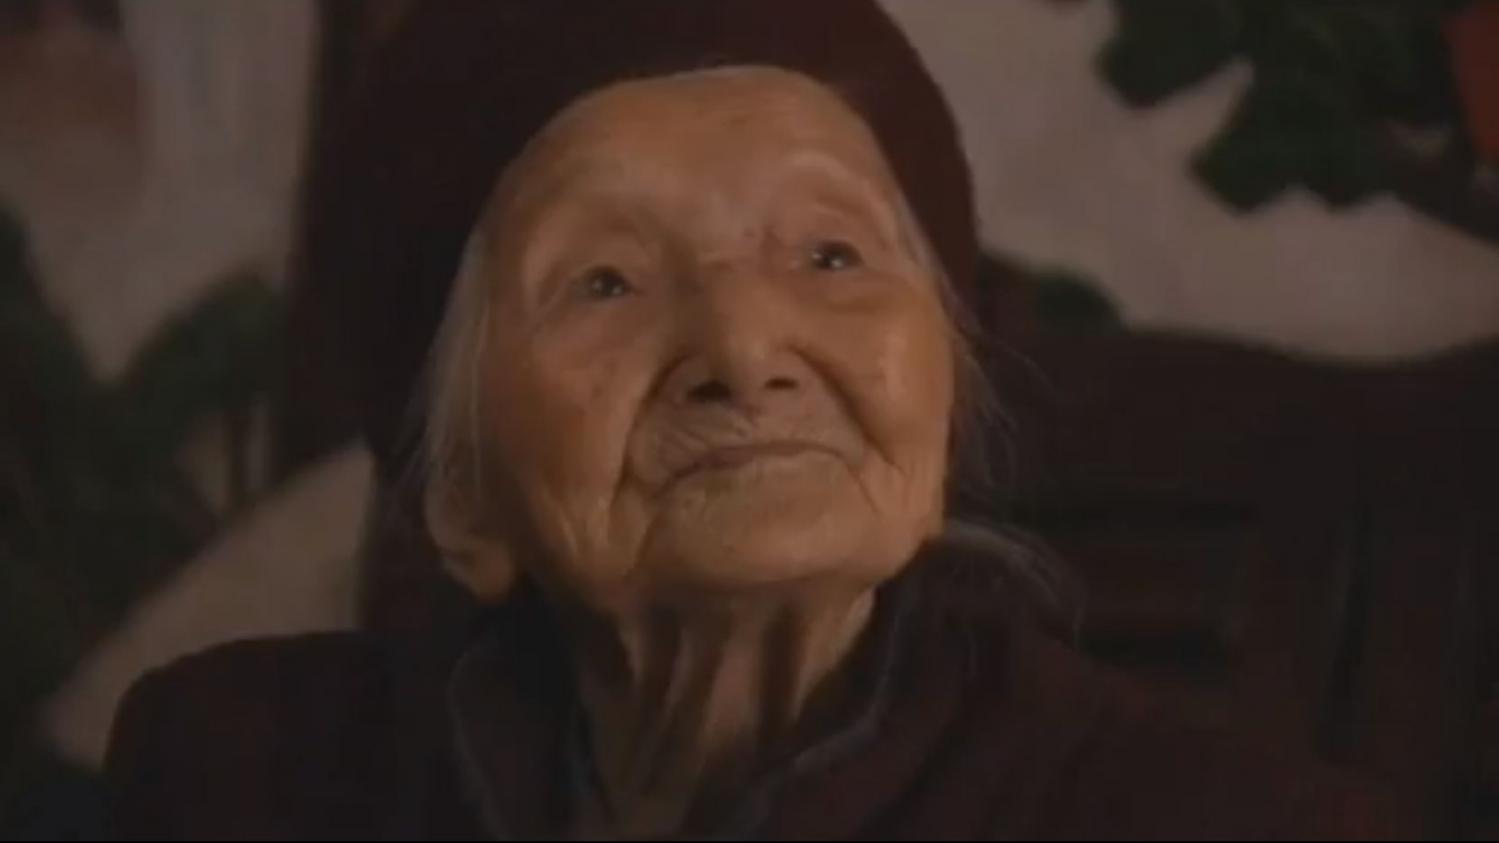 Vieux chinois gay sexe